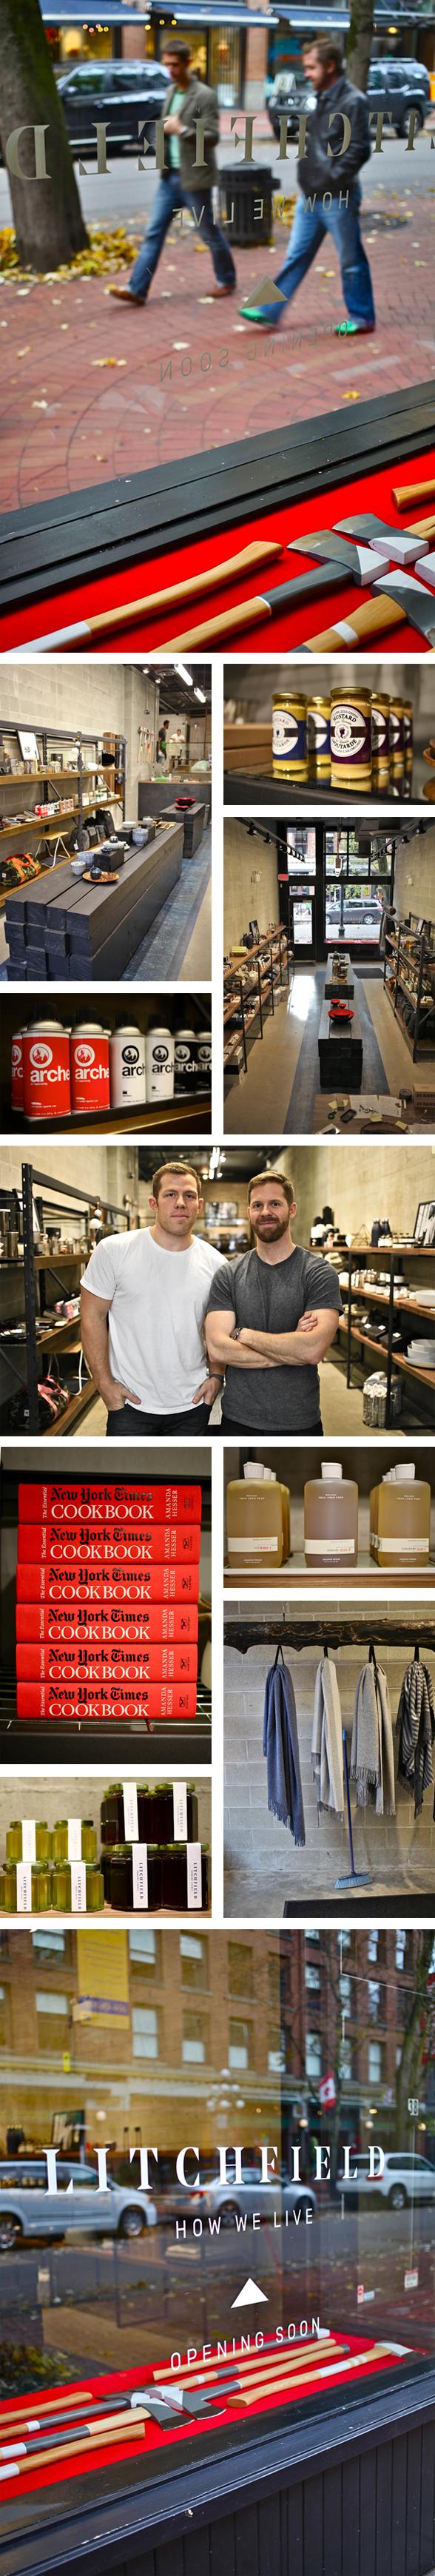 Man Cave Store Vancouver : Litchfield blu realty unique property marketing